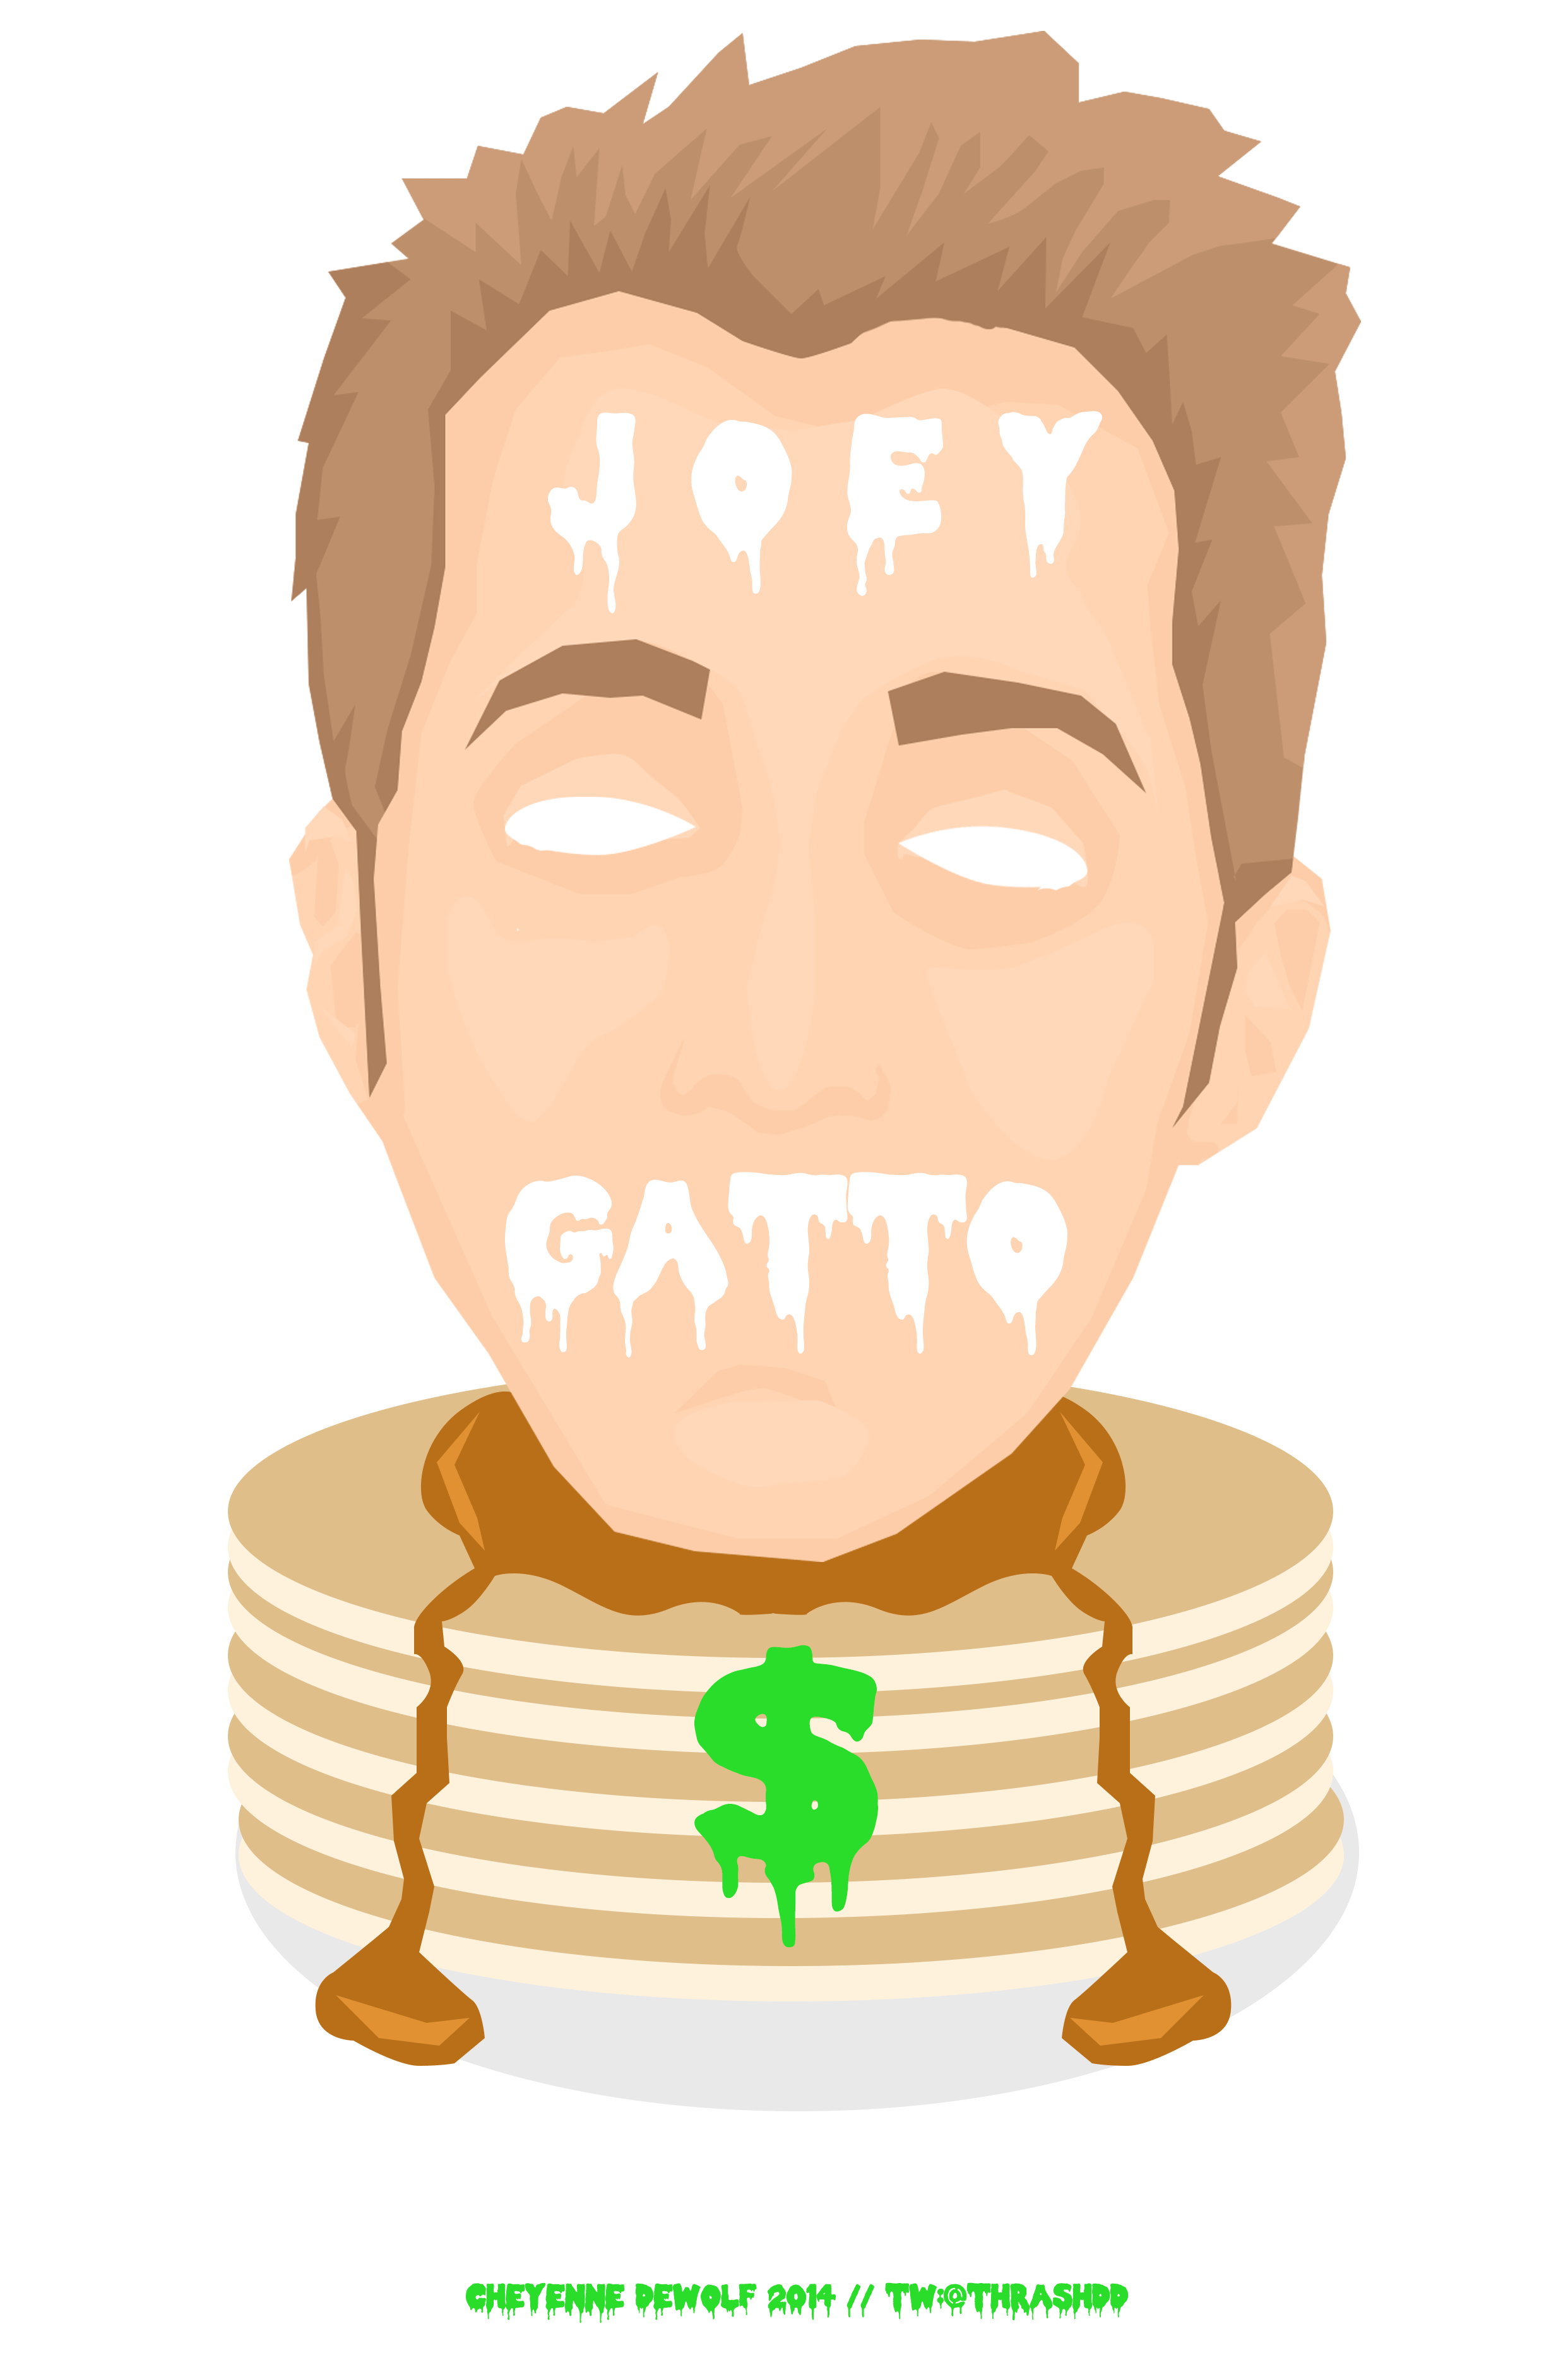 joey-gatto-pancake-vector-full.png